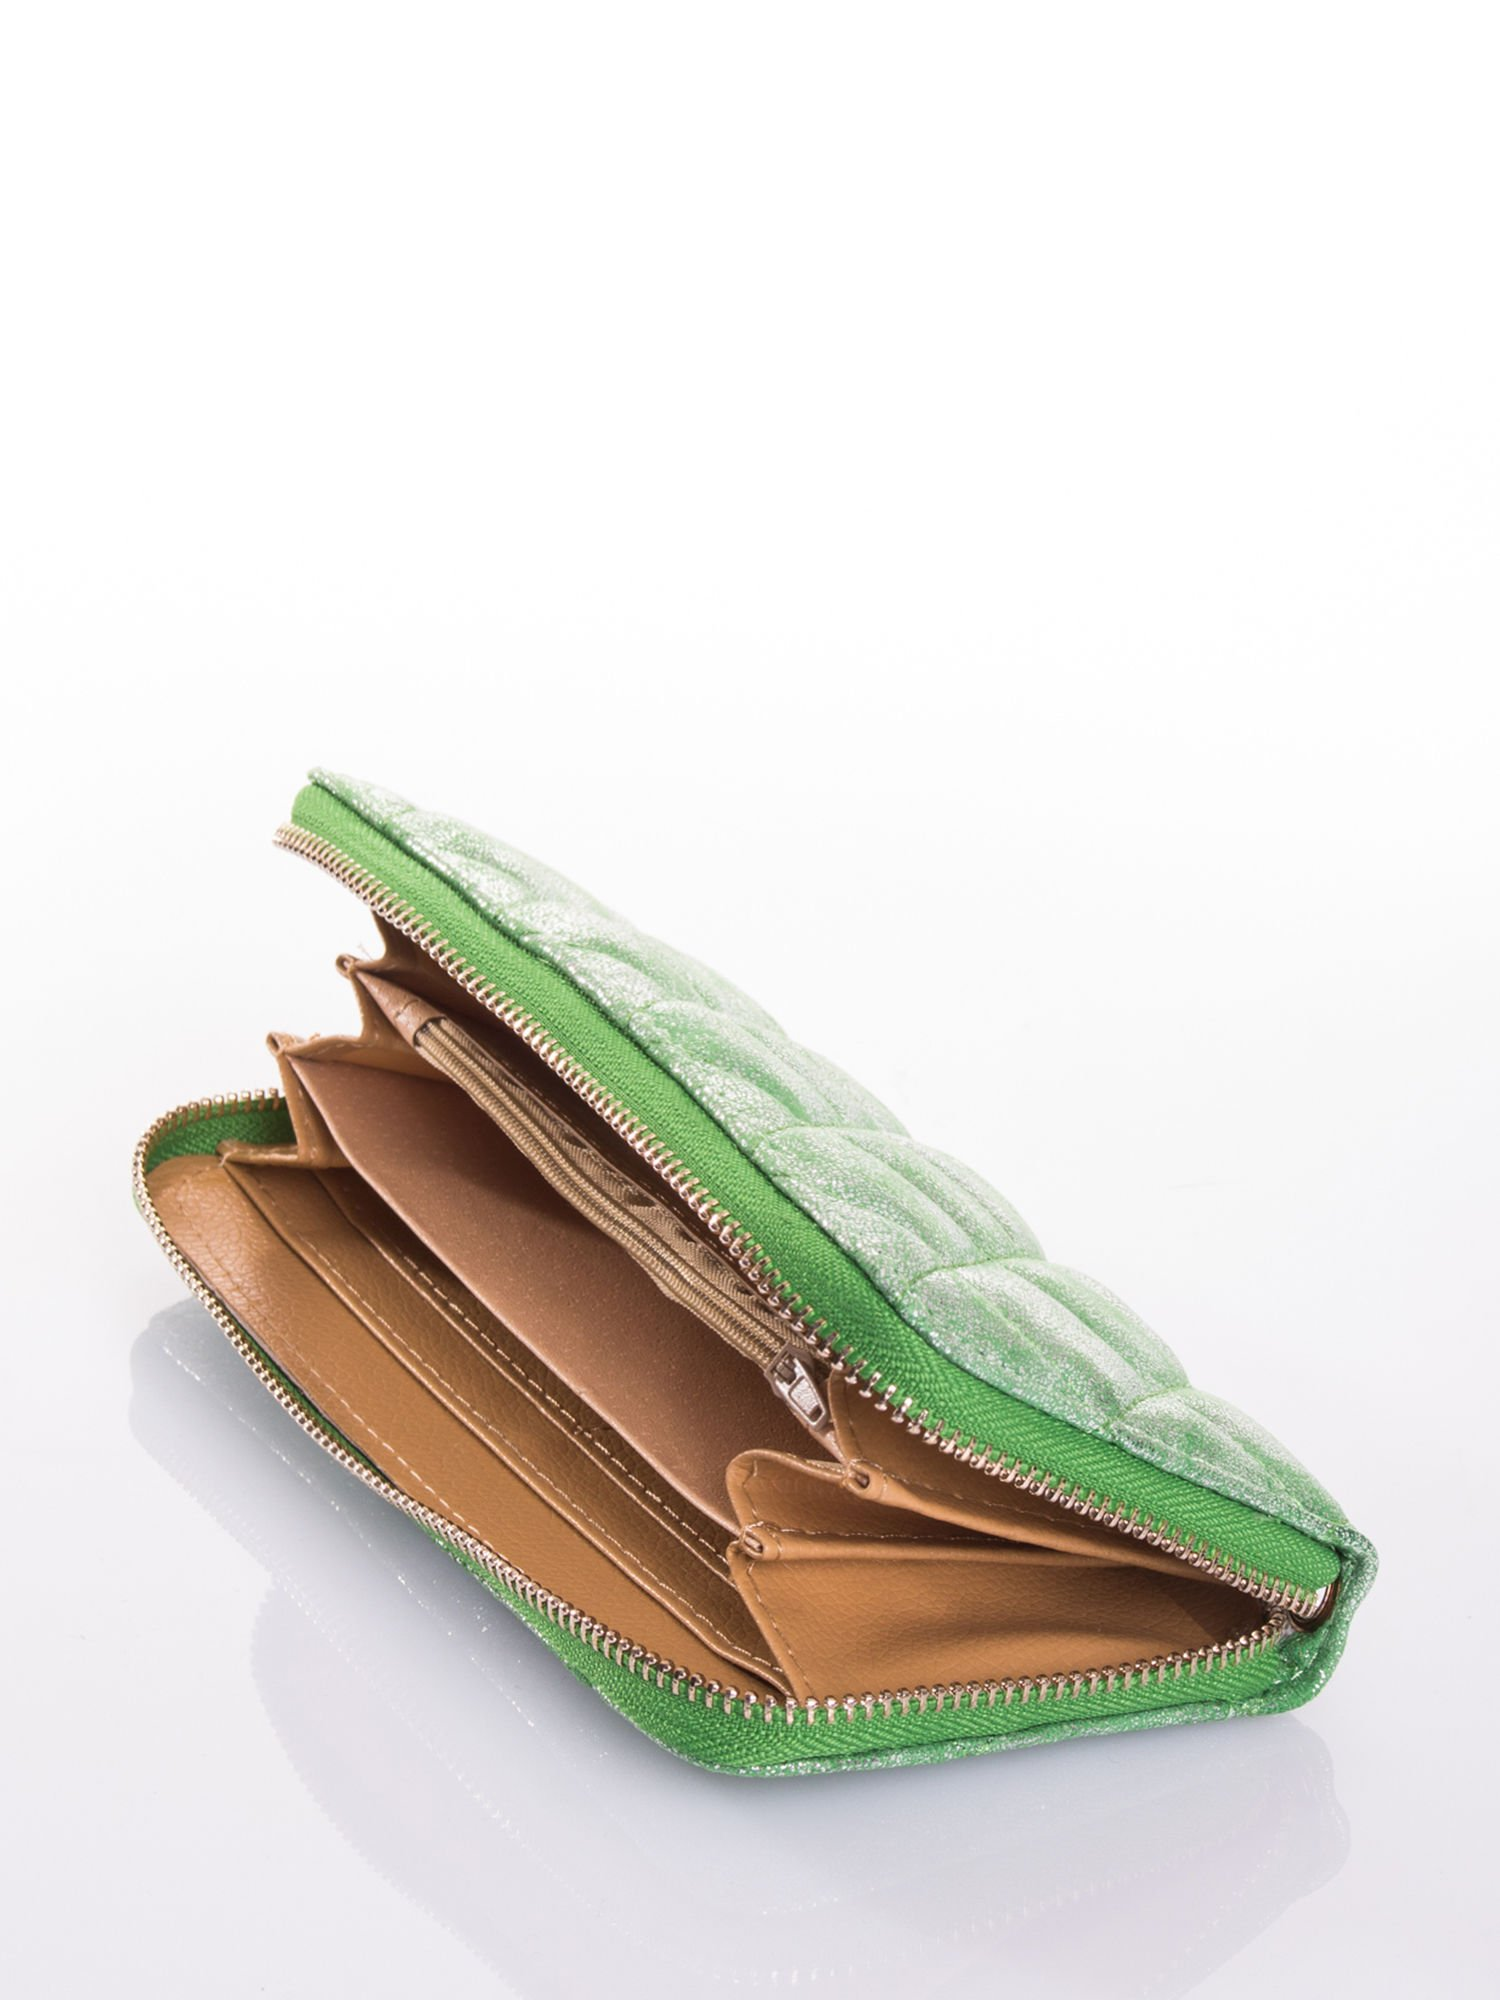 Zielony pikowany portfel                                  zdj.                                  3